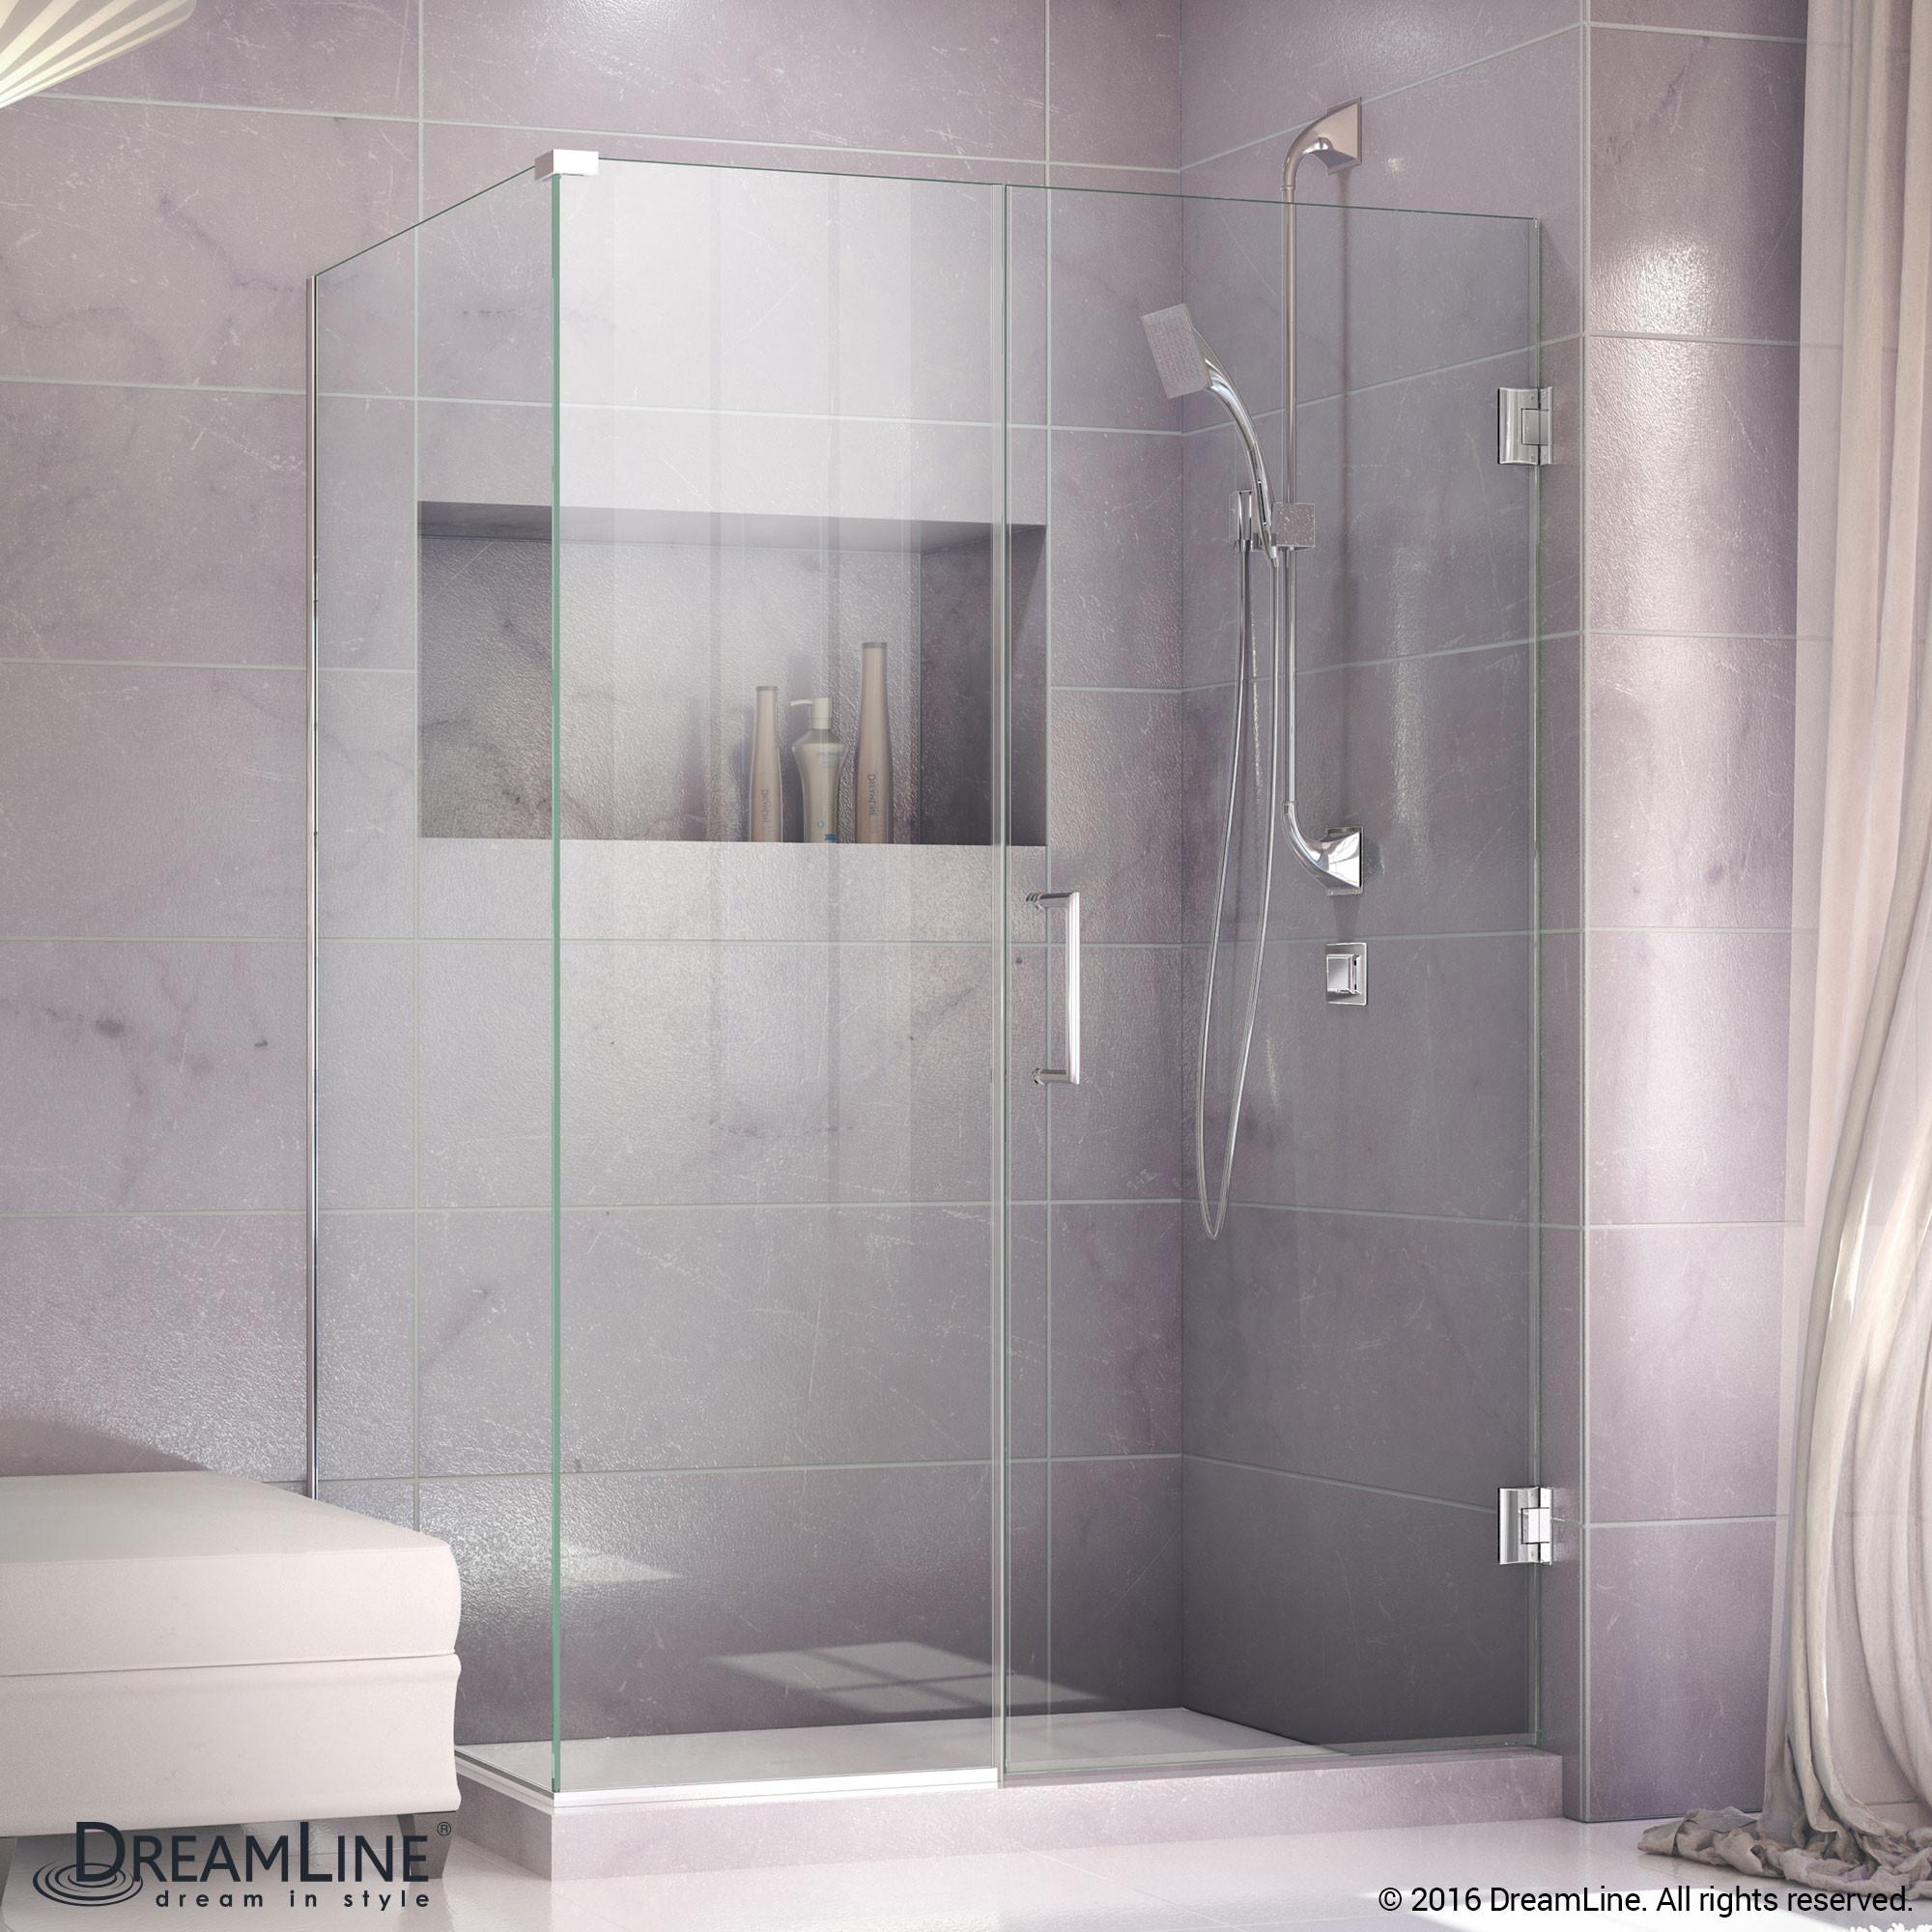 DreamLine SHEN-24535300-01 Unidoor Plus Hinged Shower Enclosure In Chrome Finish Hardware